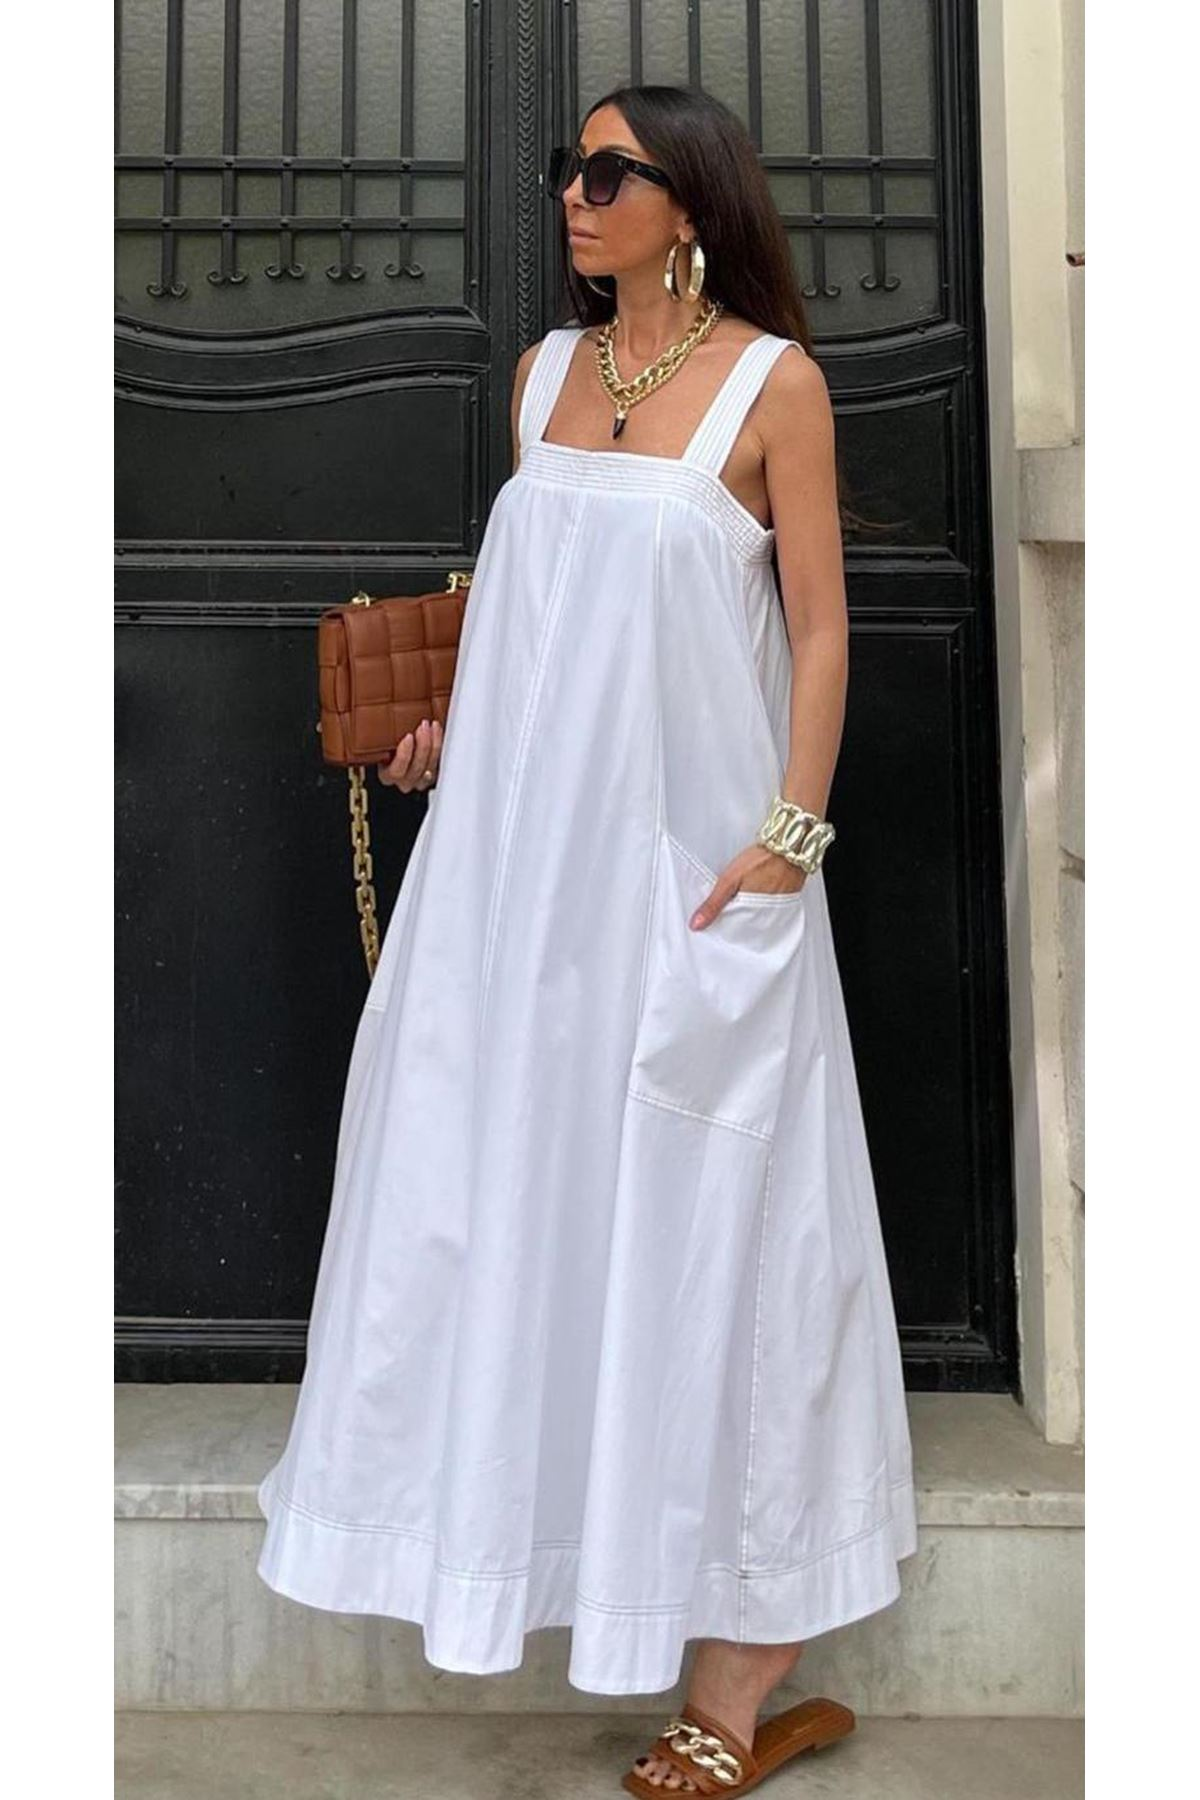 Cep Detaylı Vual Dokuma Elbise - BEYAZ